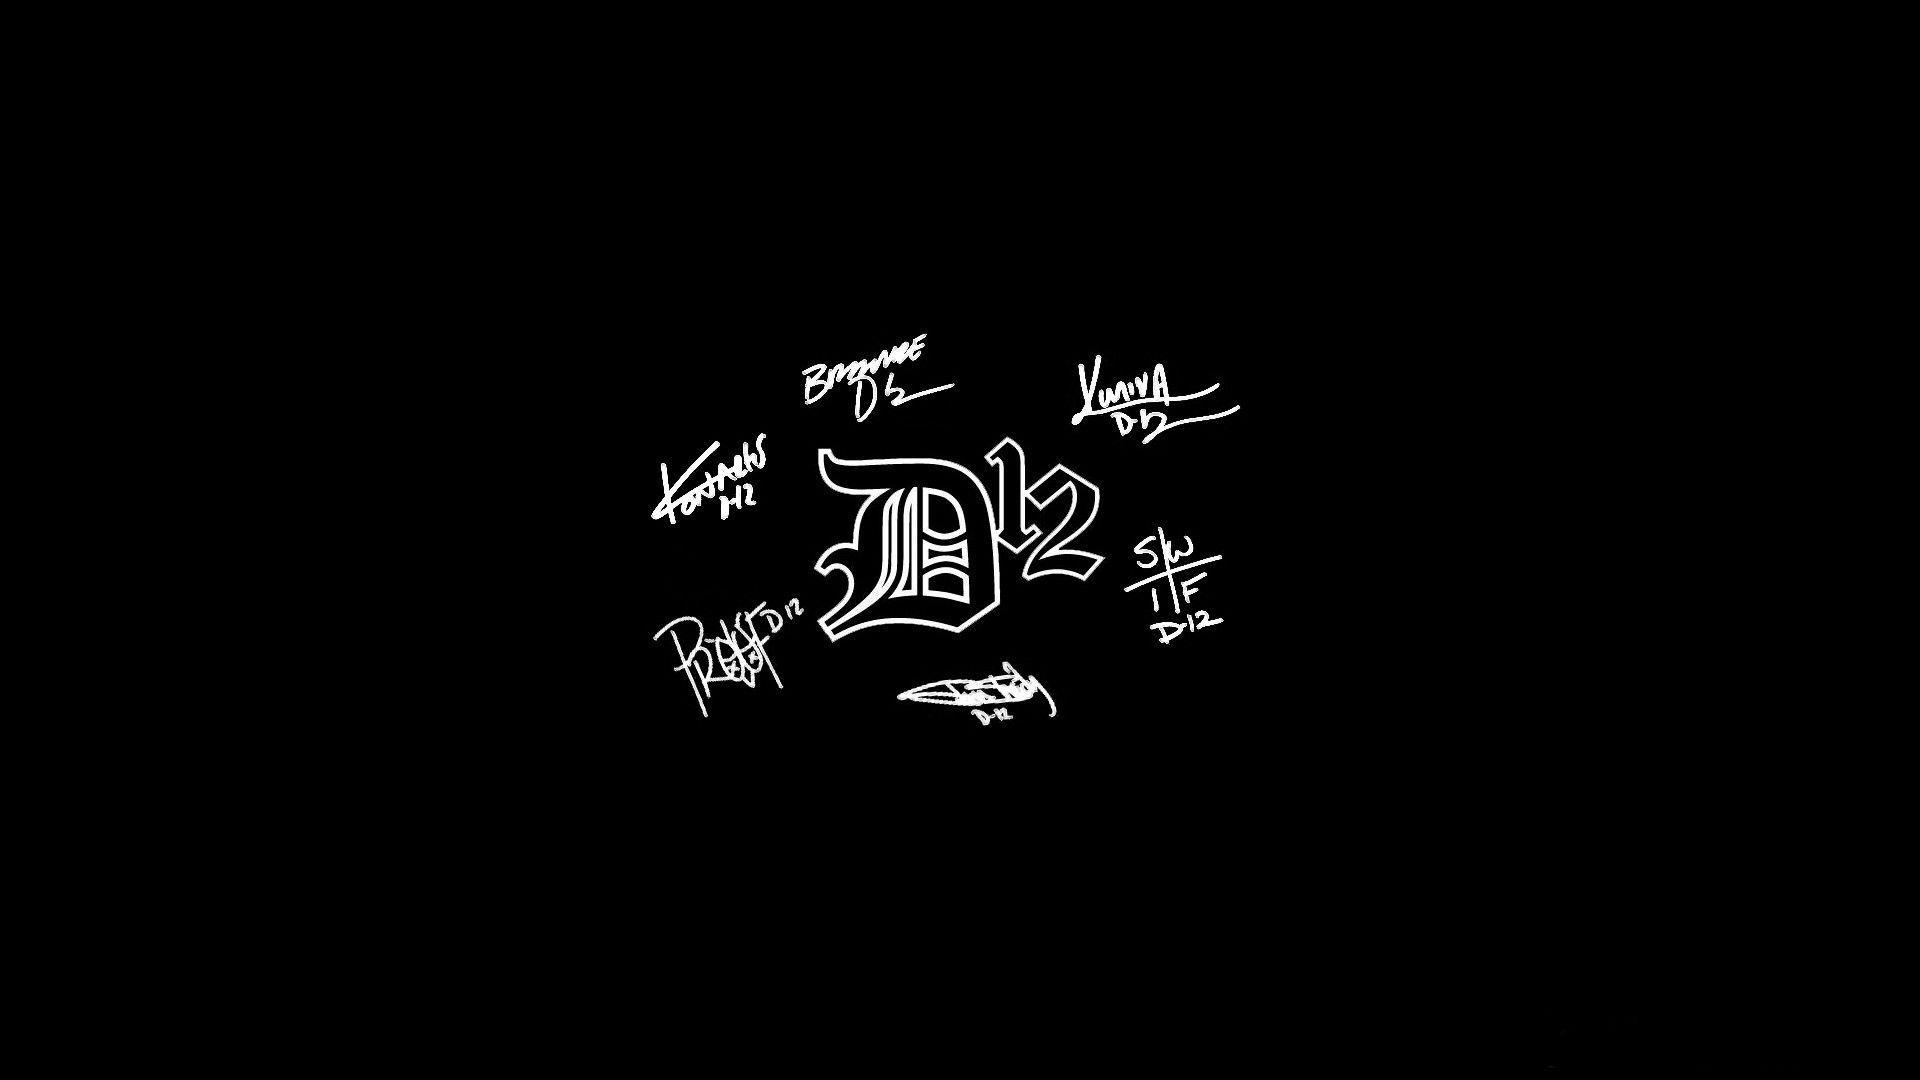 D12 Wallpaper